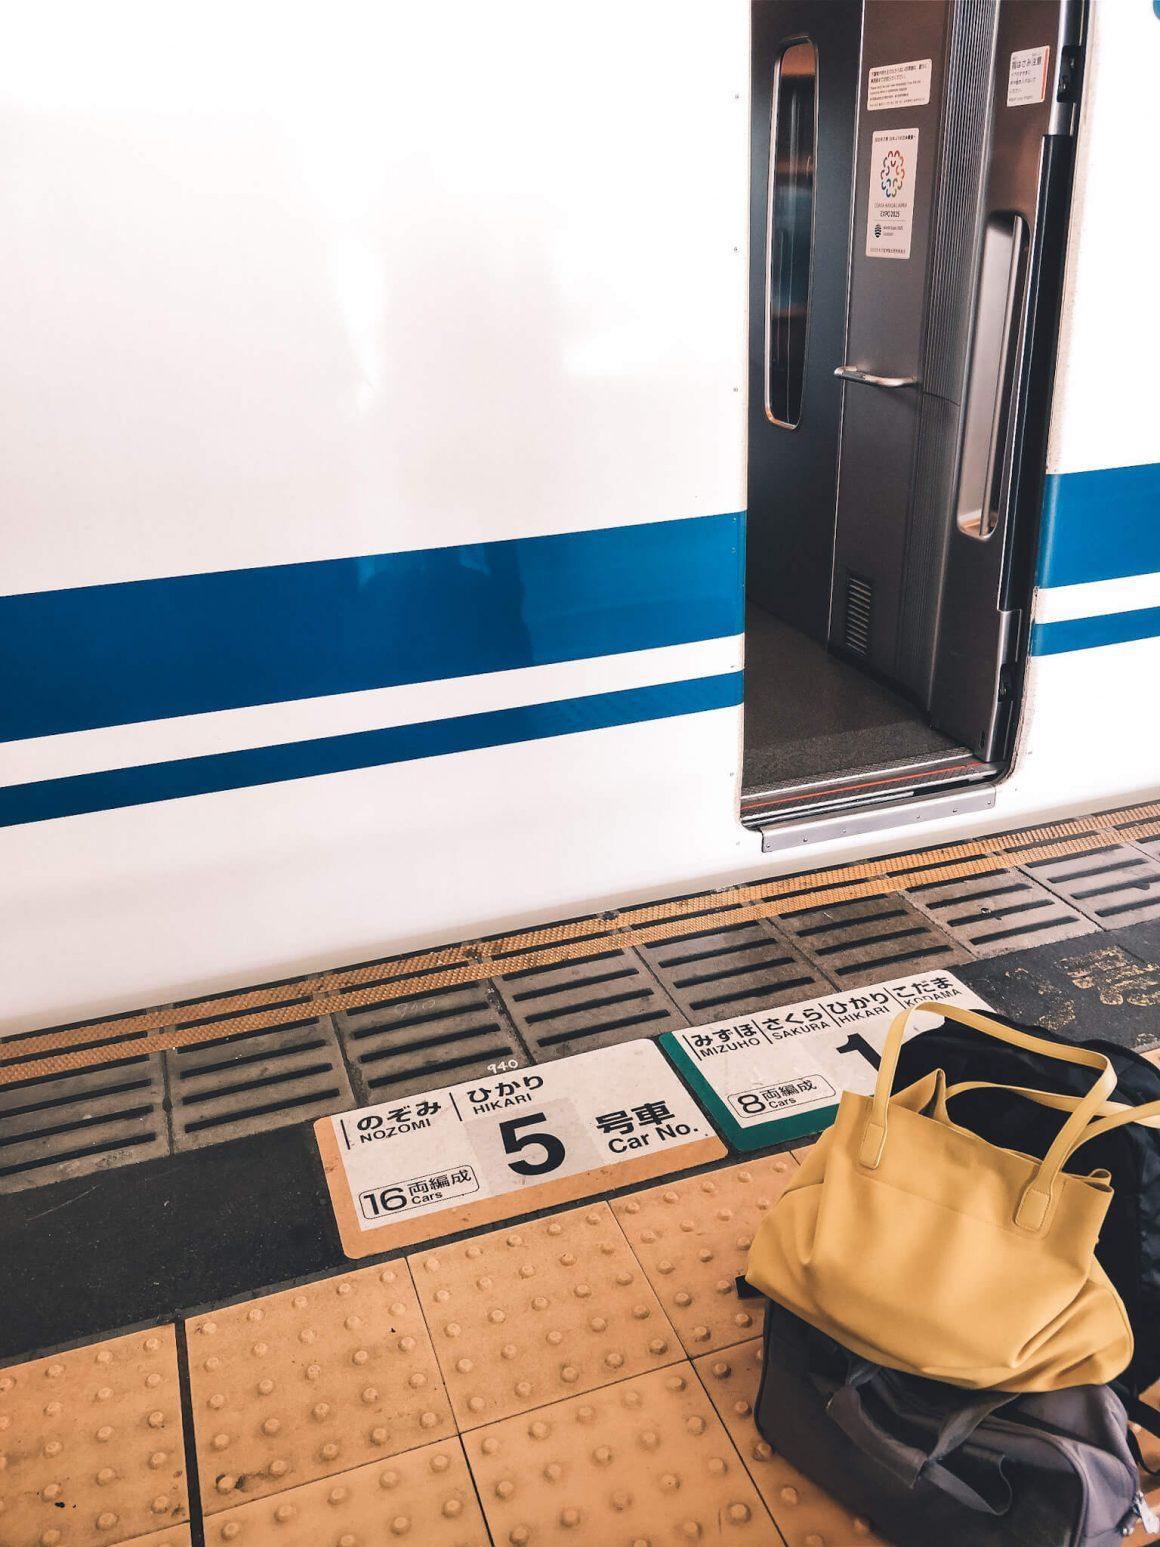 Japan Railpass nummers station